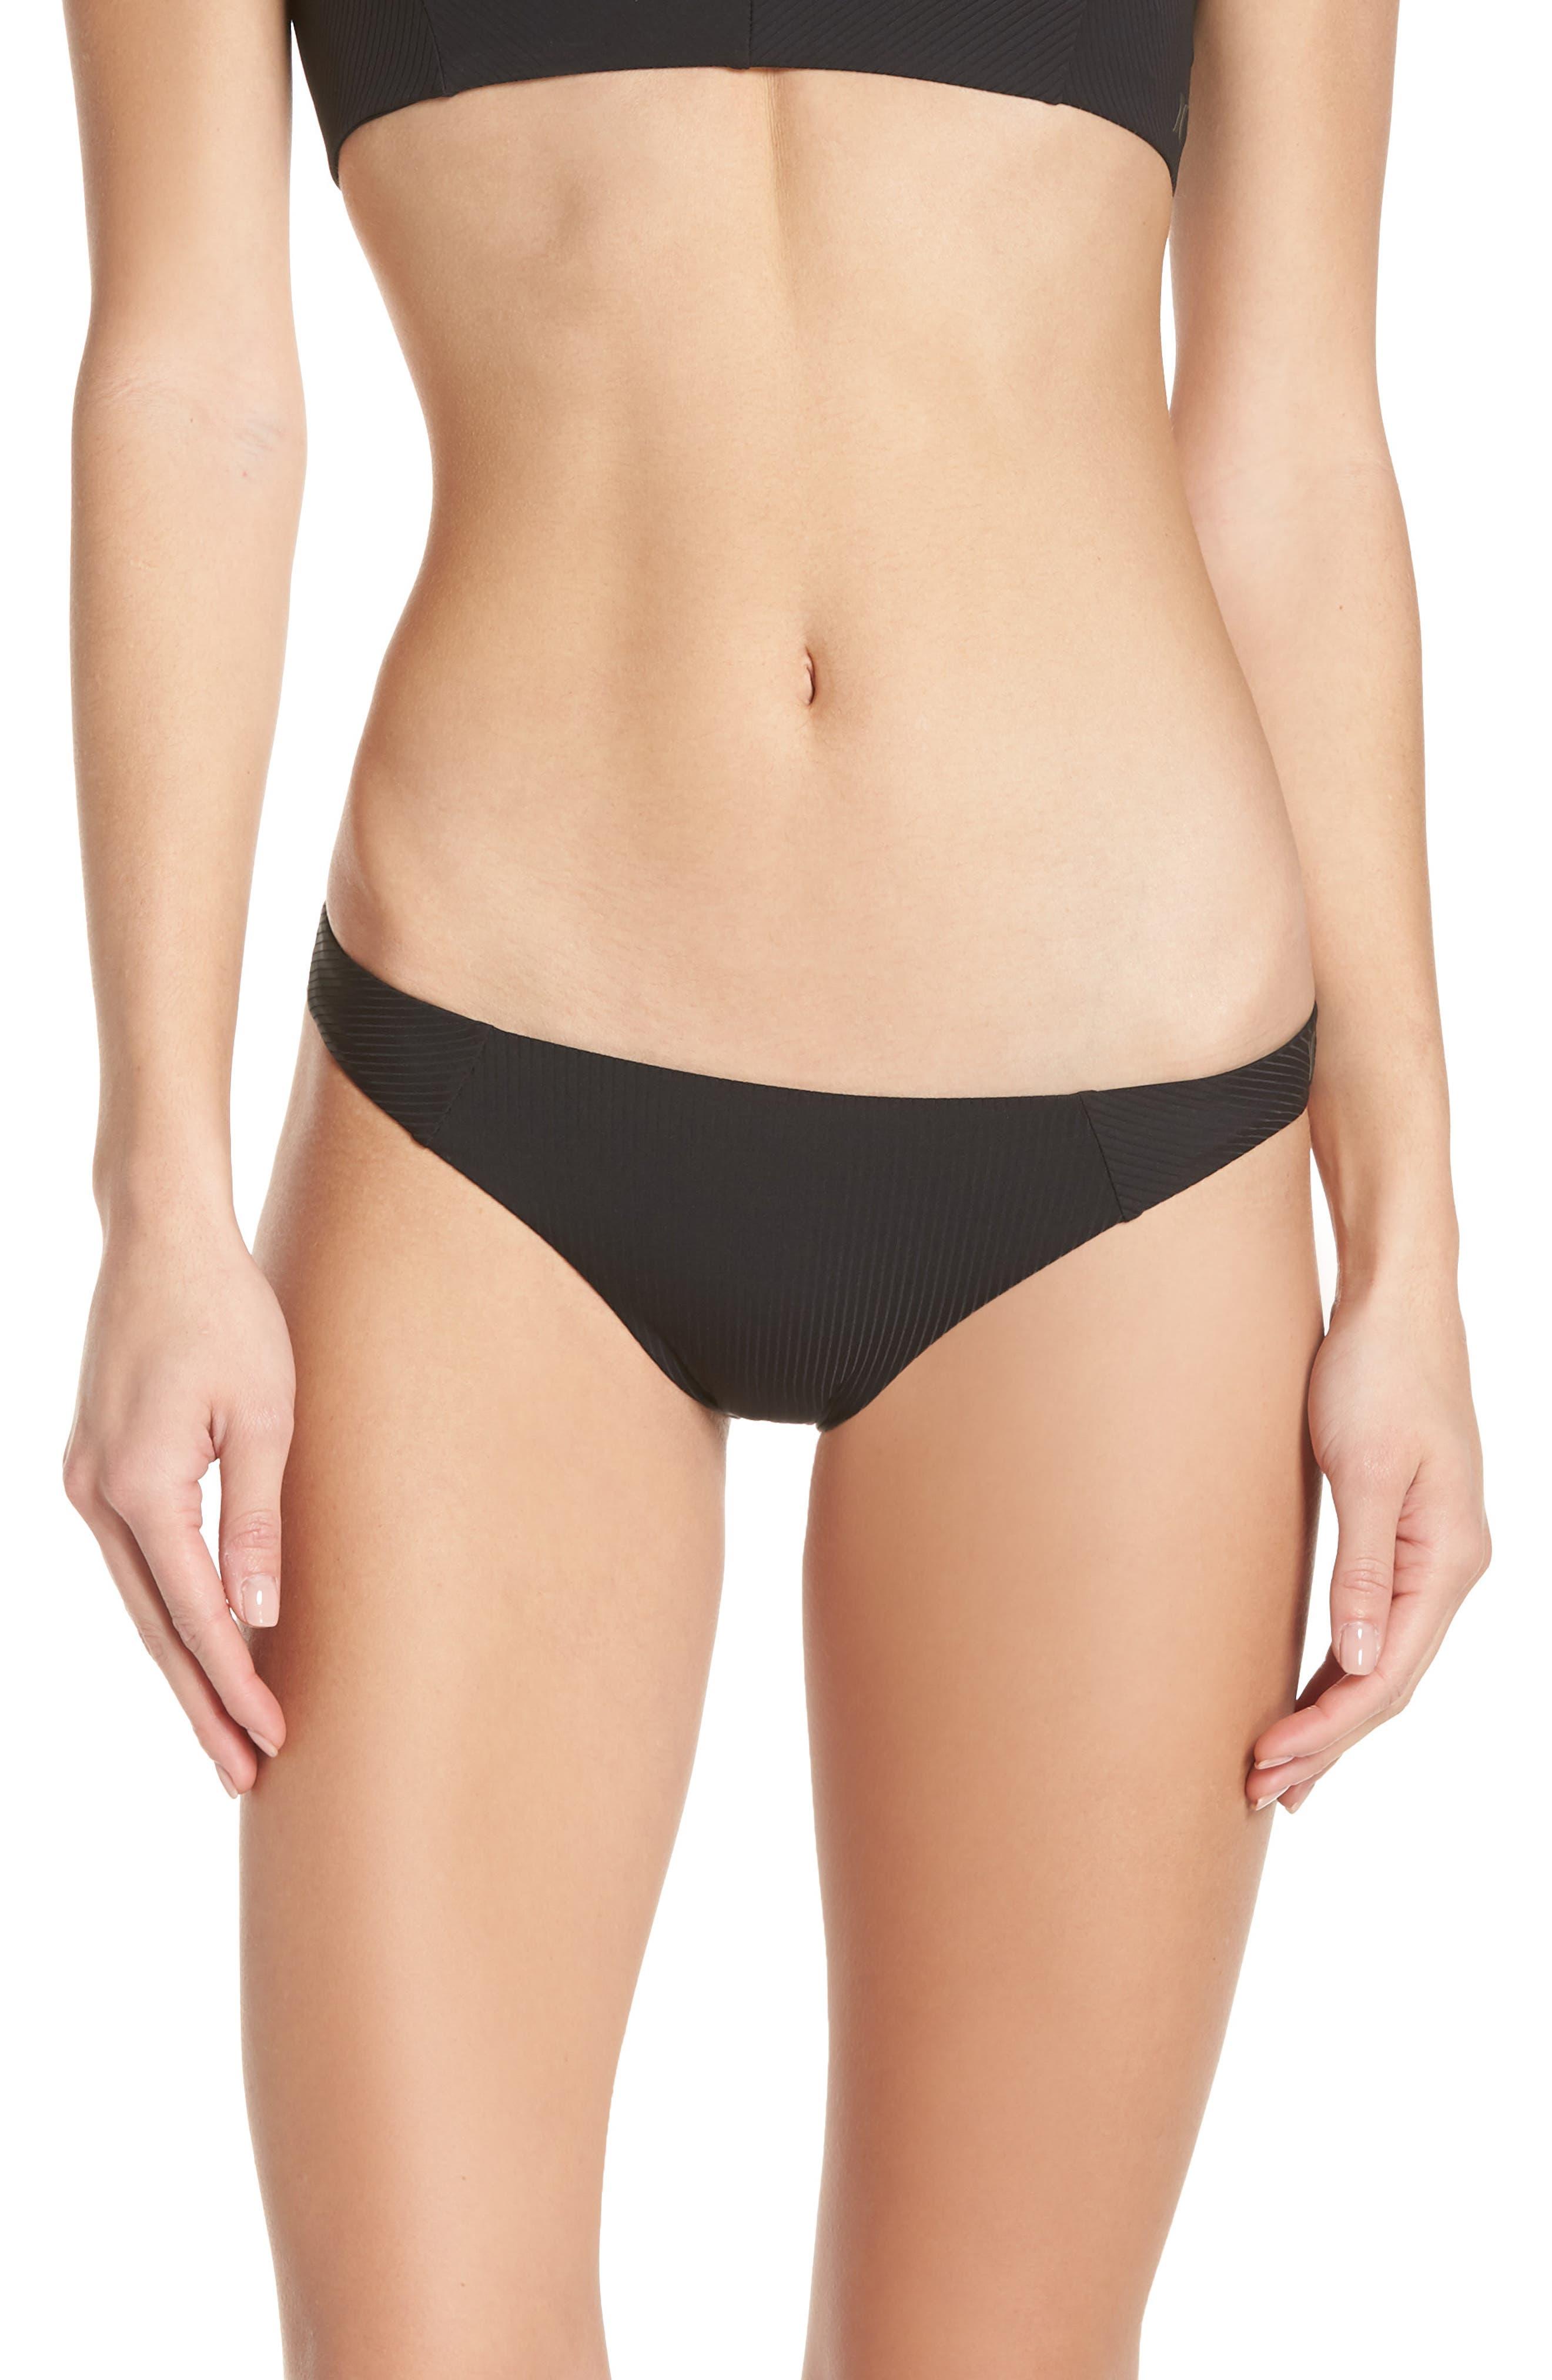 Hurley Quick-Dry Surf Bikini Bottoms, Black